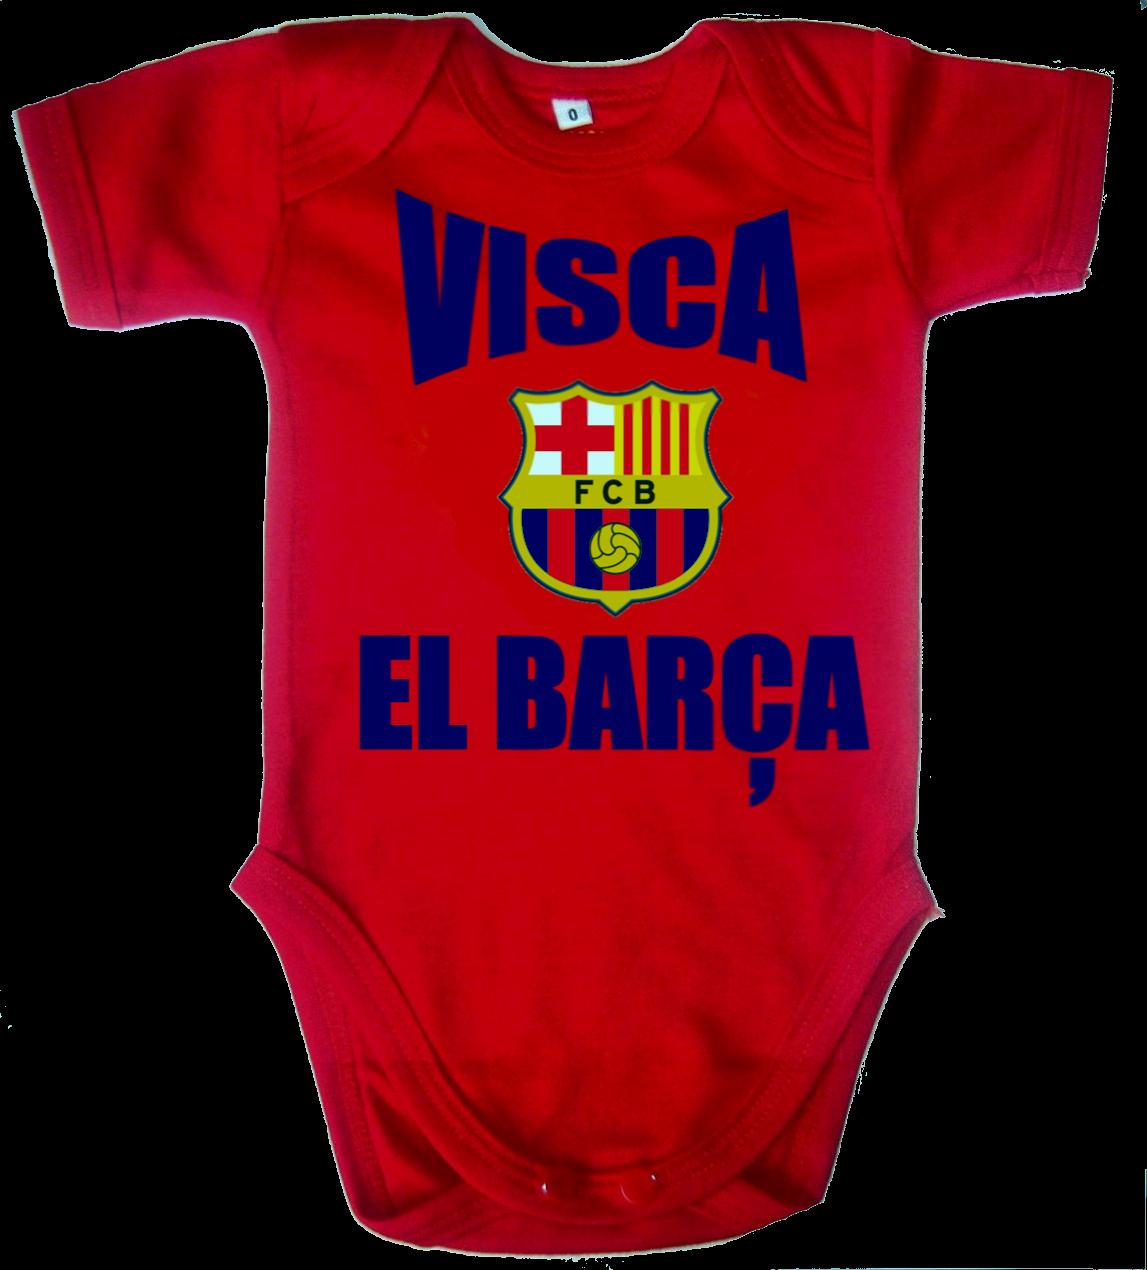 Ropa para bebe body bodie futbol viva barcelona baby monster png 1147x1270 Ropa  de bebe barcelona 35caa6500f9